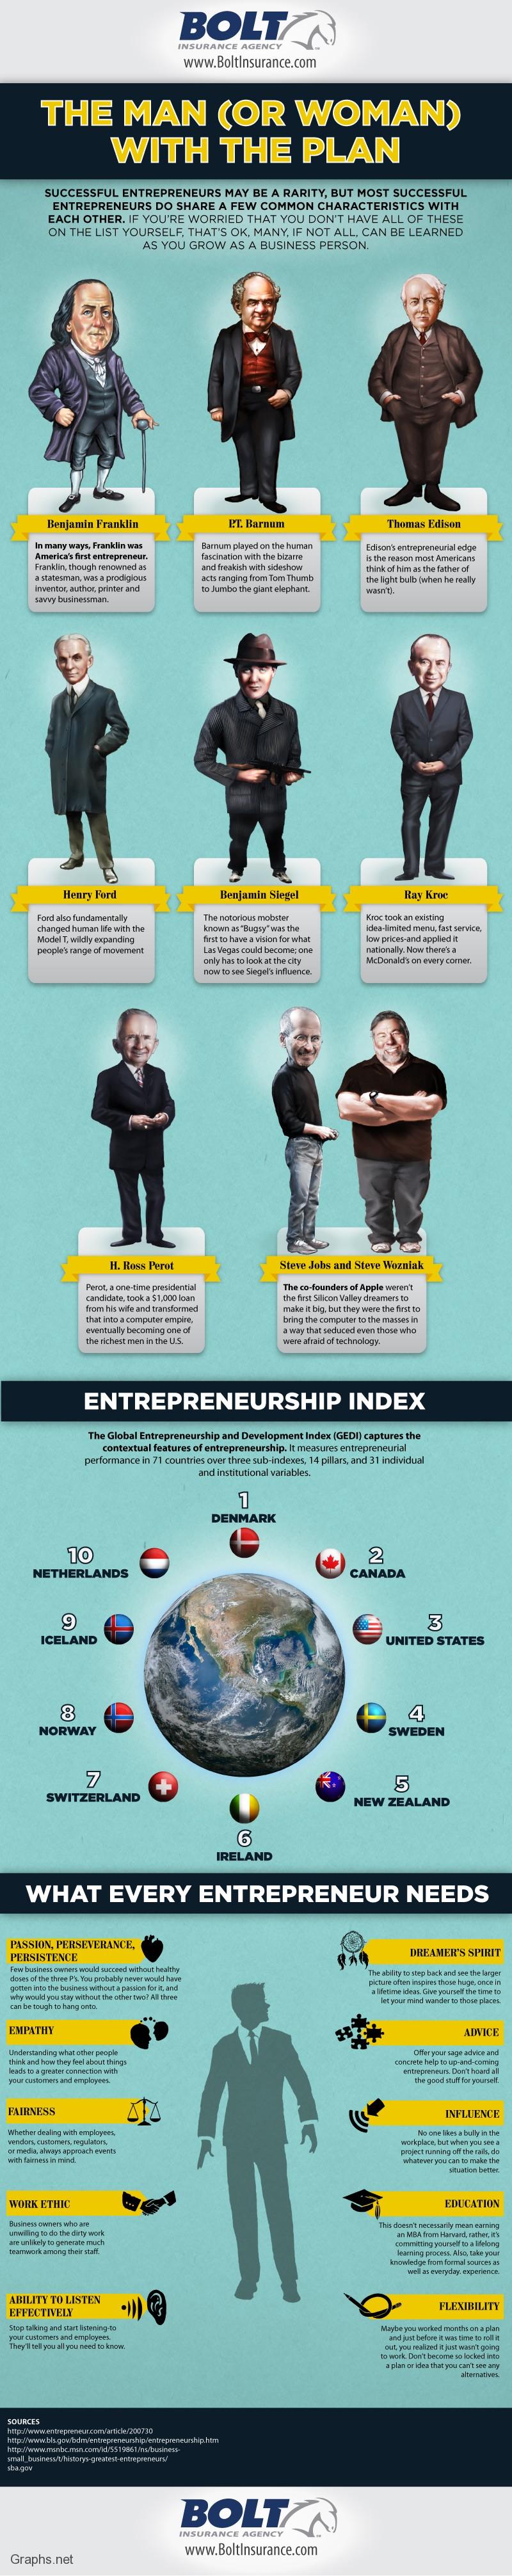 World's Most Successful Entrepreneurs